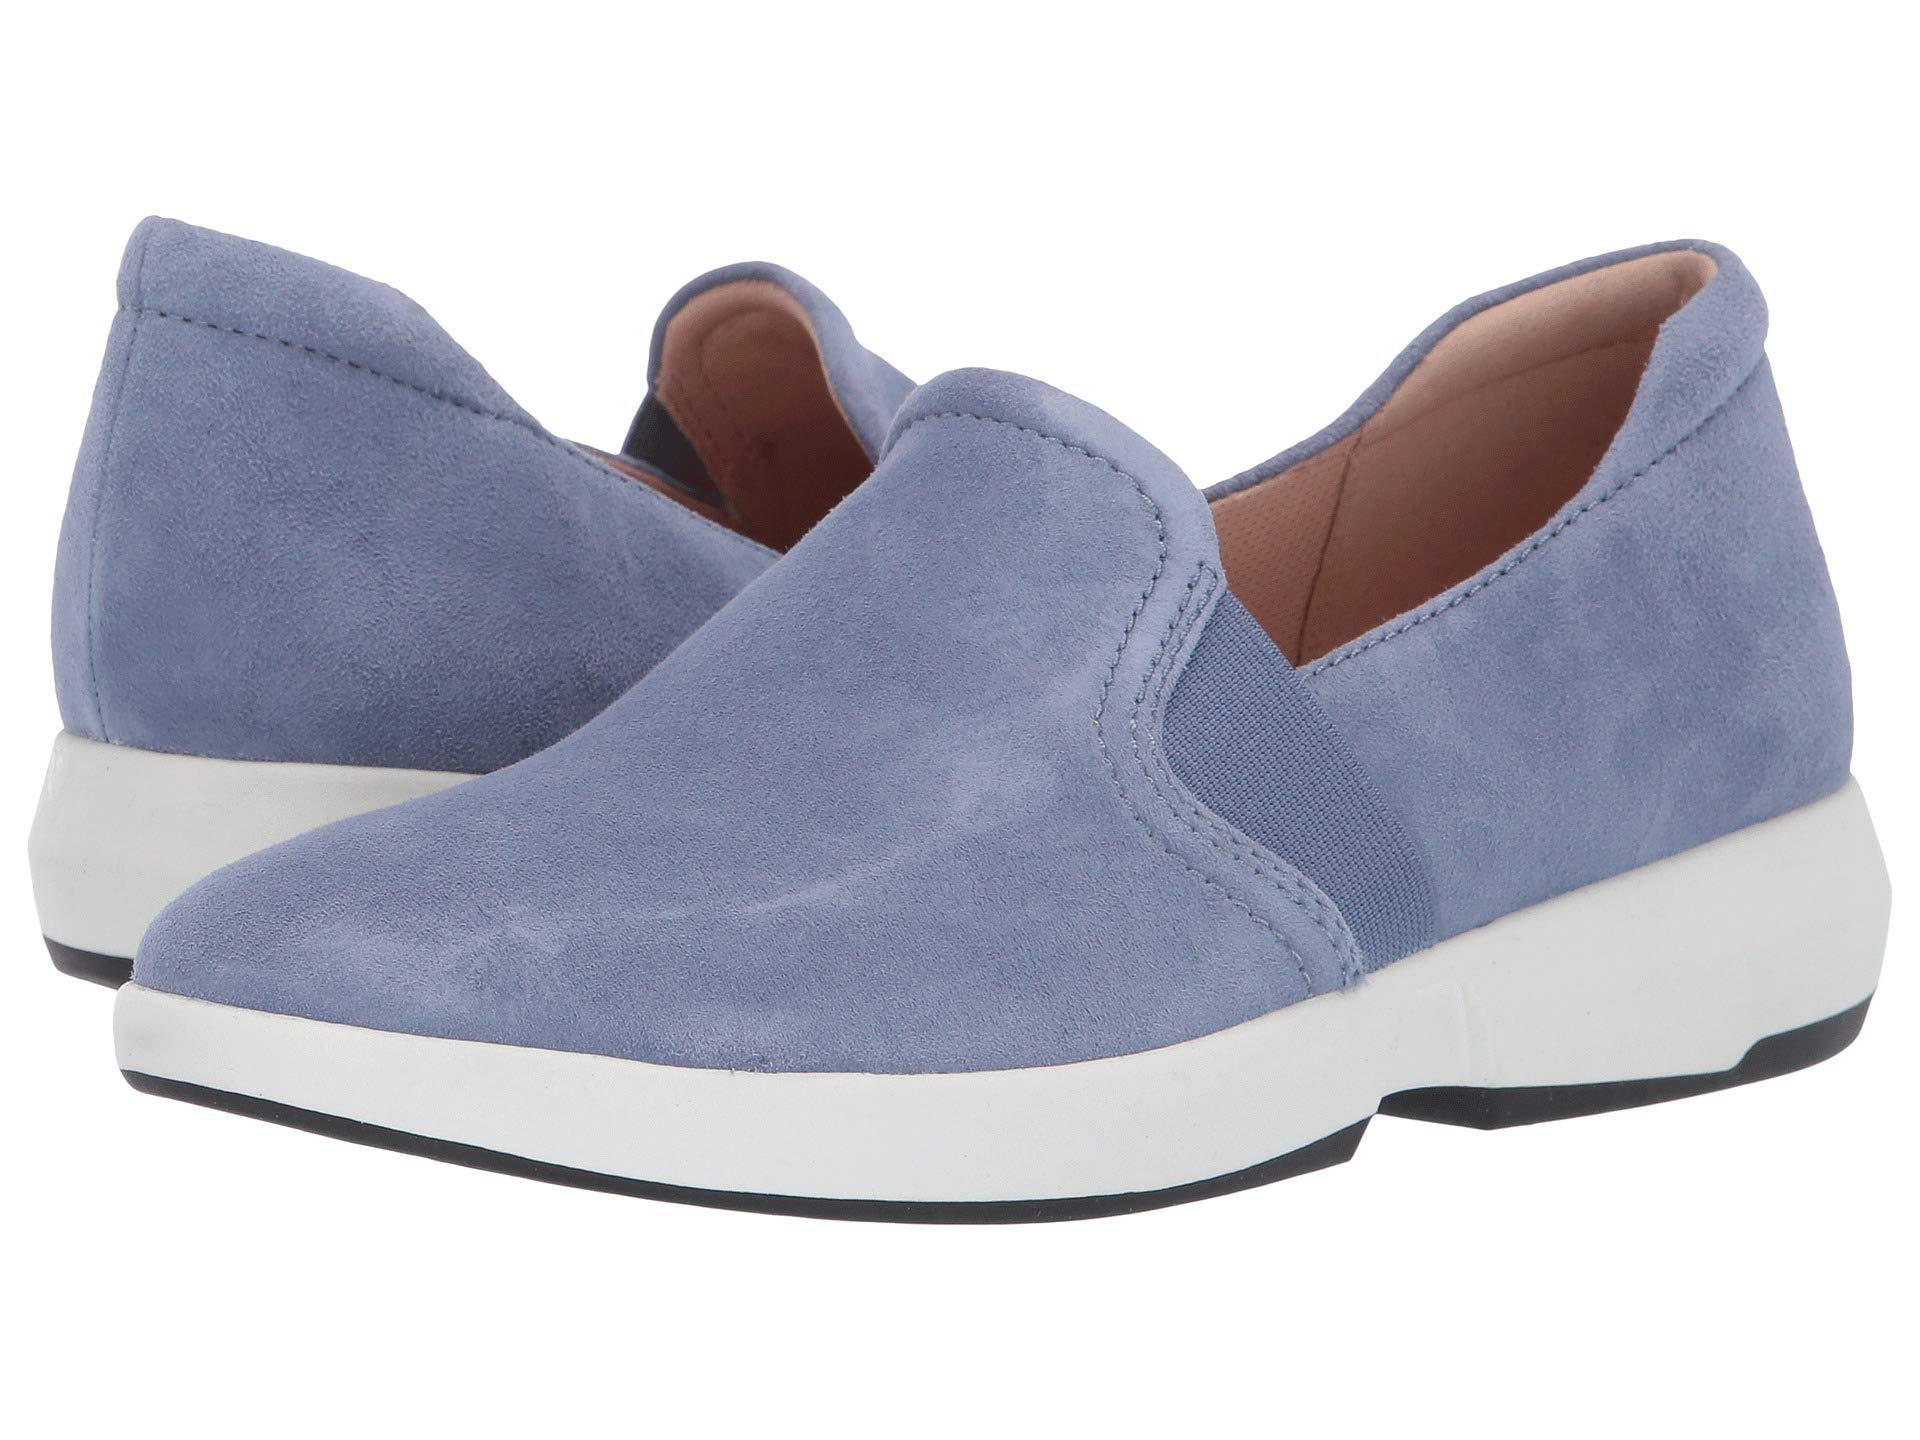 d431aab3689f Naturalizer - 27 Edit Dionne (sky Blue Suede) Women s Shoes - Lyst. View  fullscreen